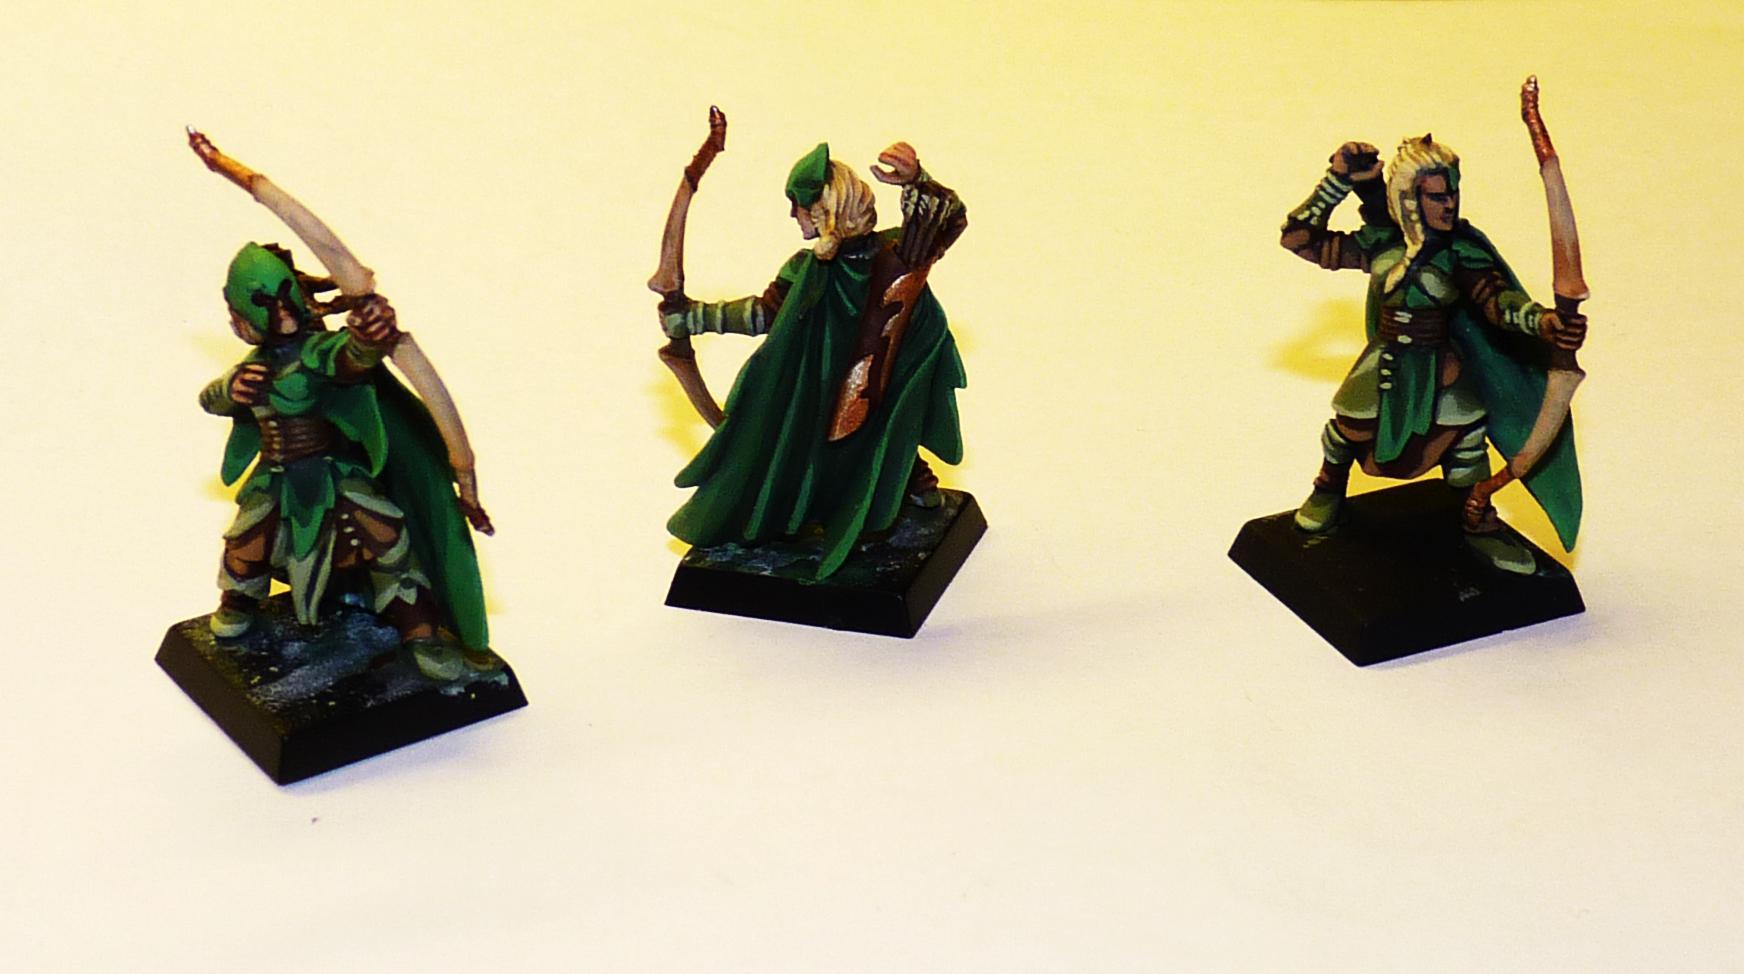 Asrai, Elves, Wfb, Wood